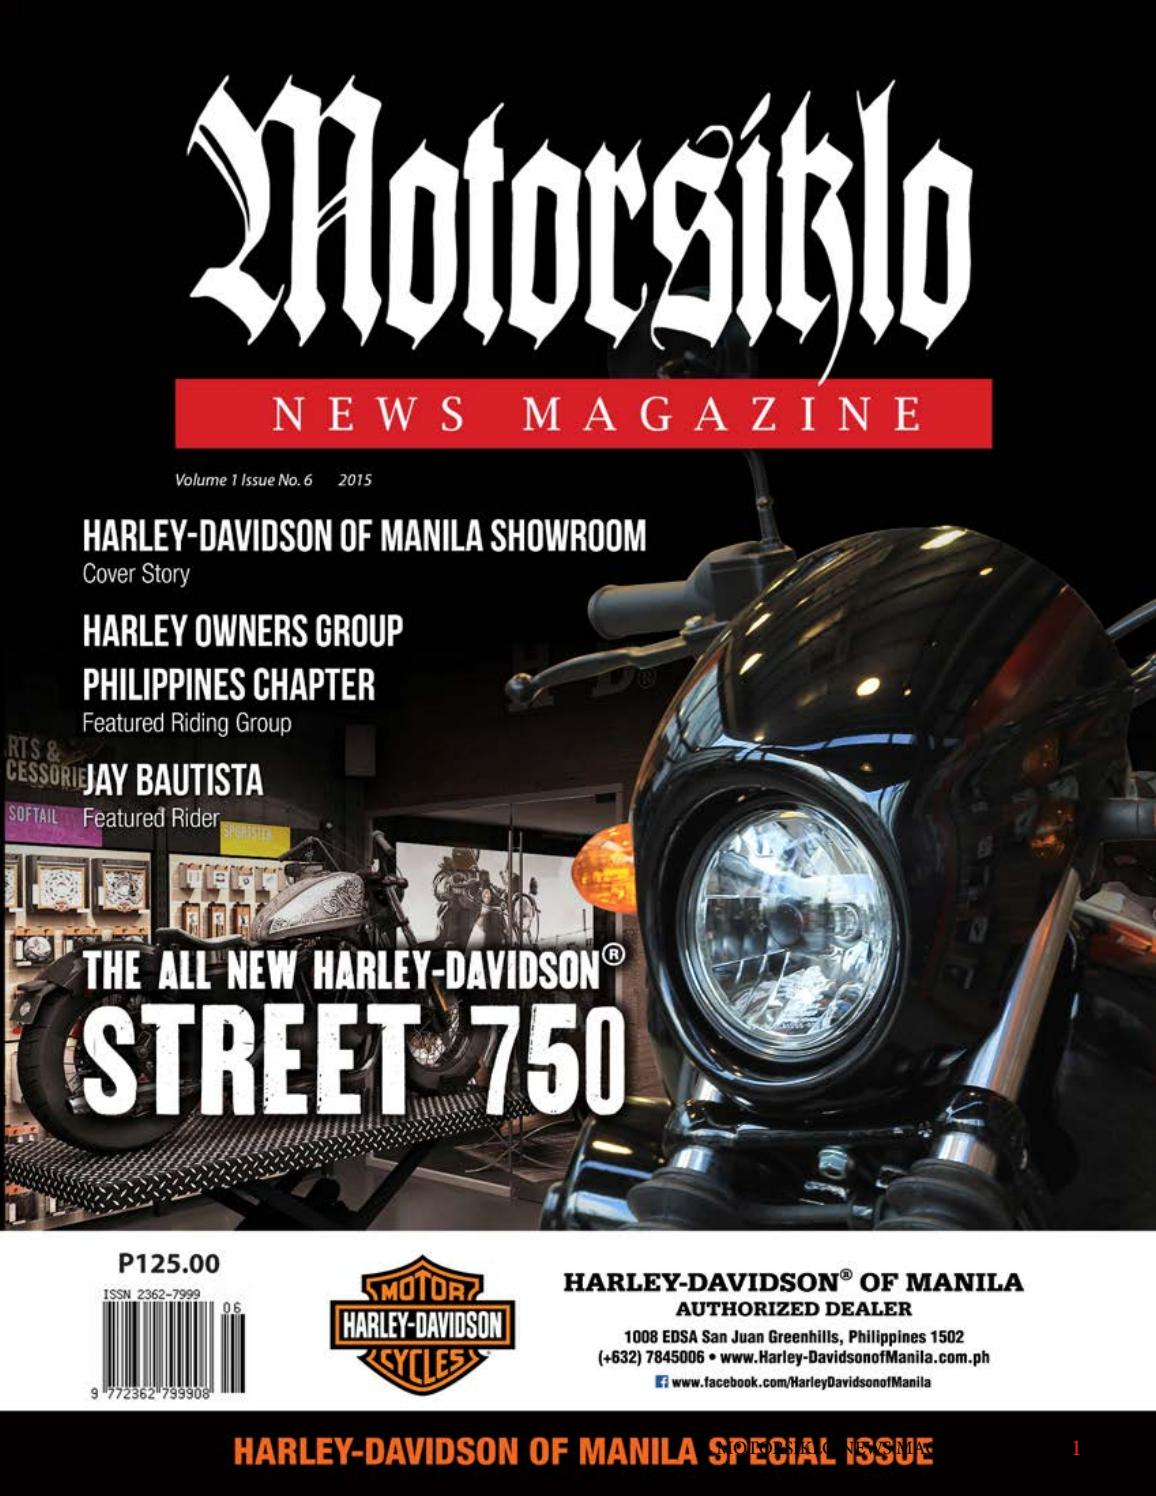 Motorsiklo News Magazine Issue Vol 1 No 6 By All New Beat Sporty Esp Cbs Iss Fusion Magenta Black Salatiga Issuu